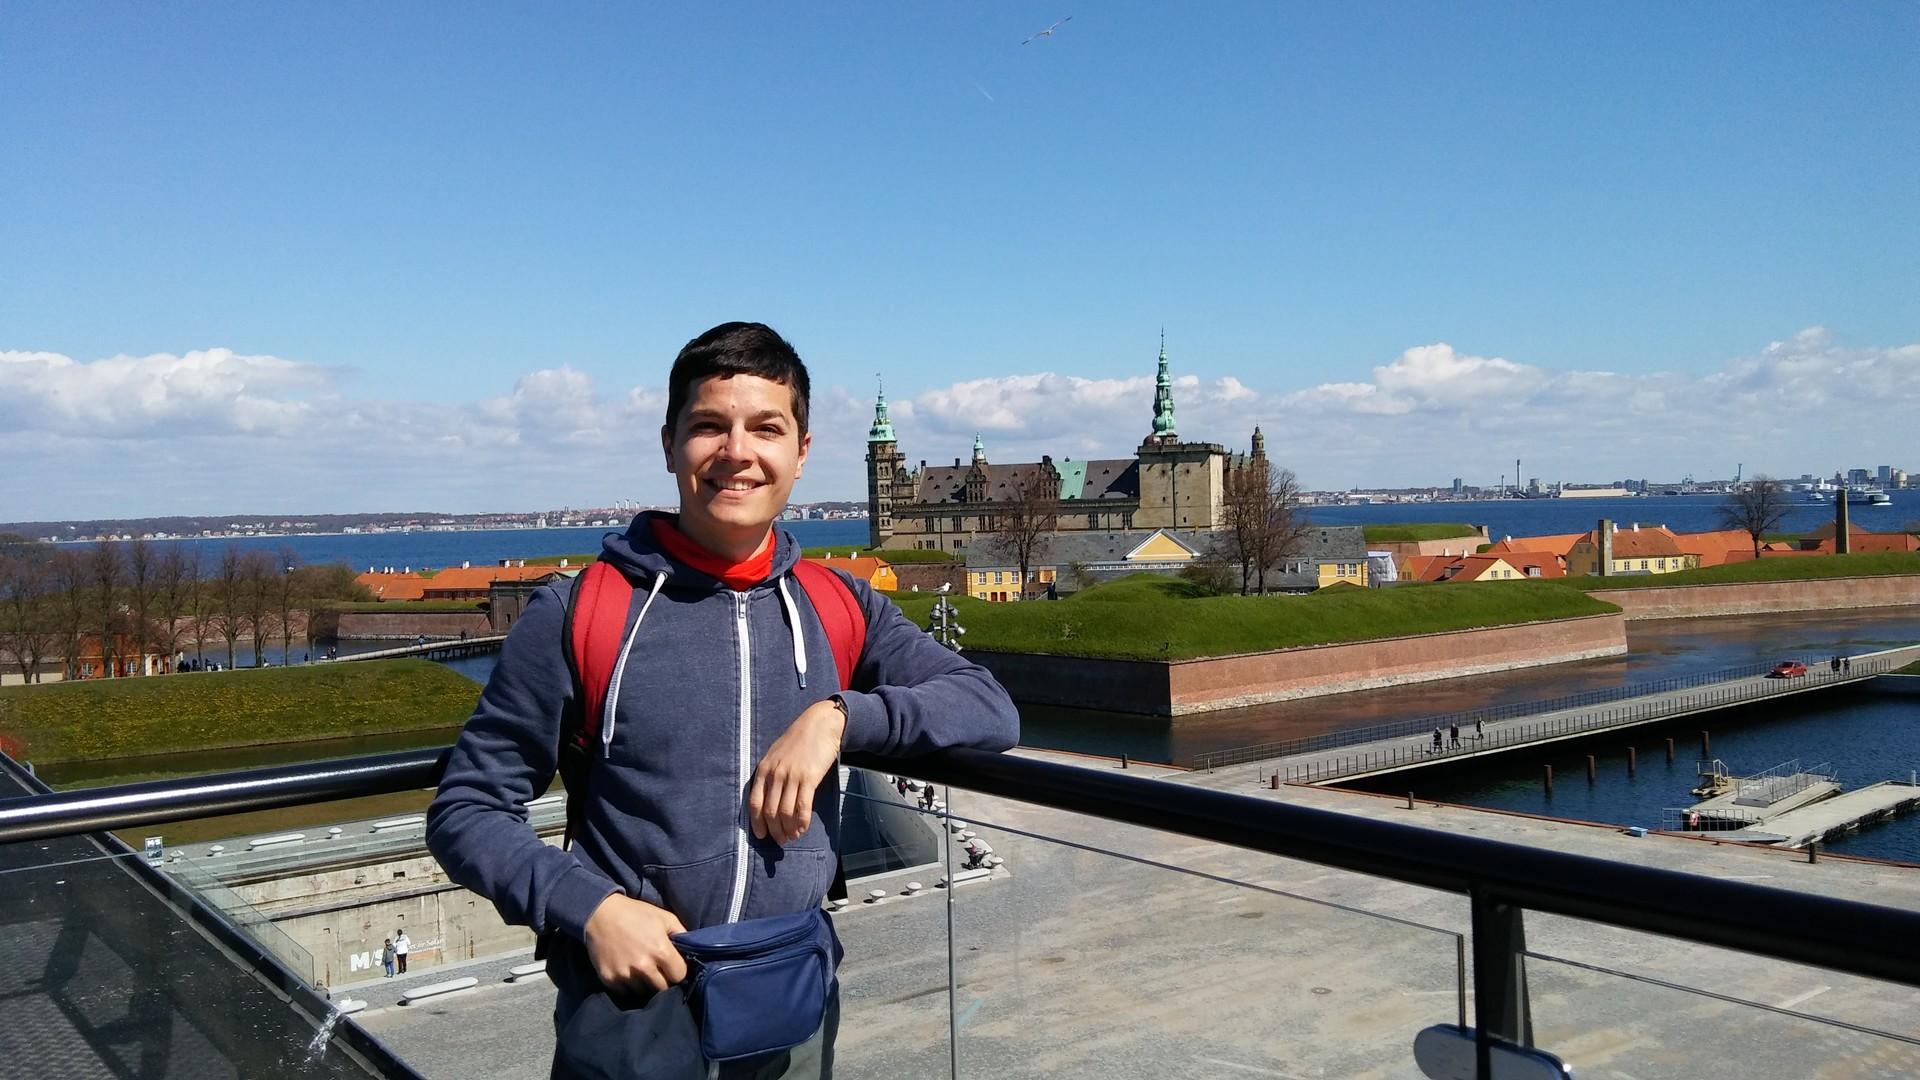 Viaje universitario a Copenhague